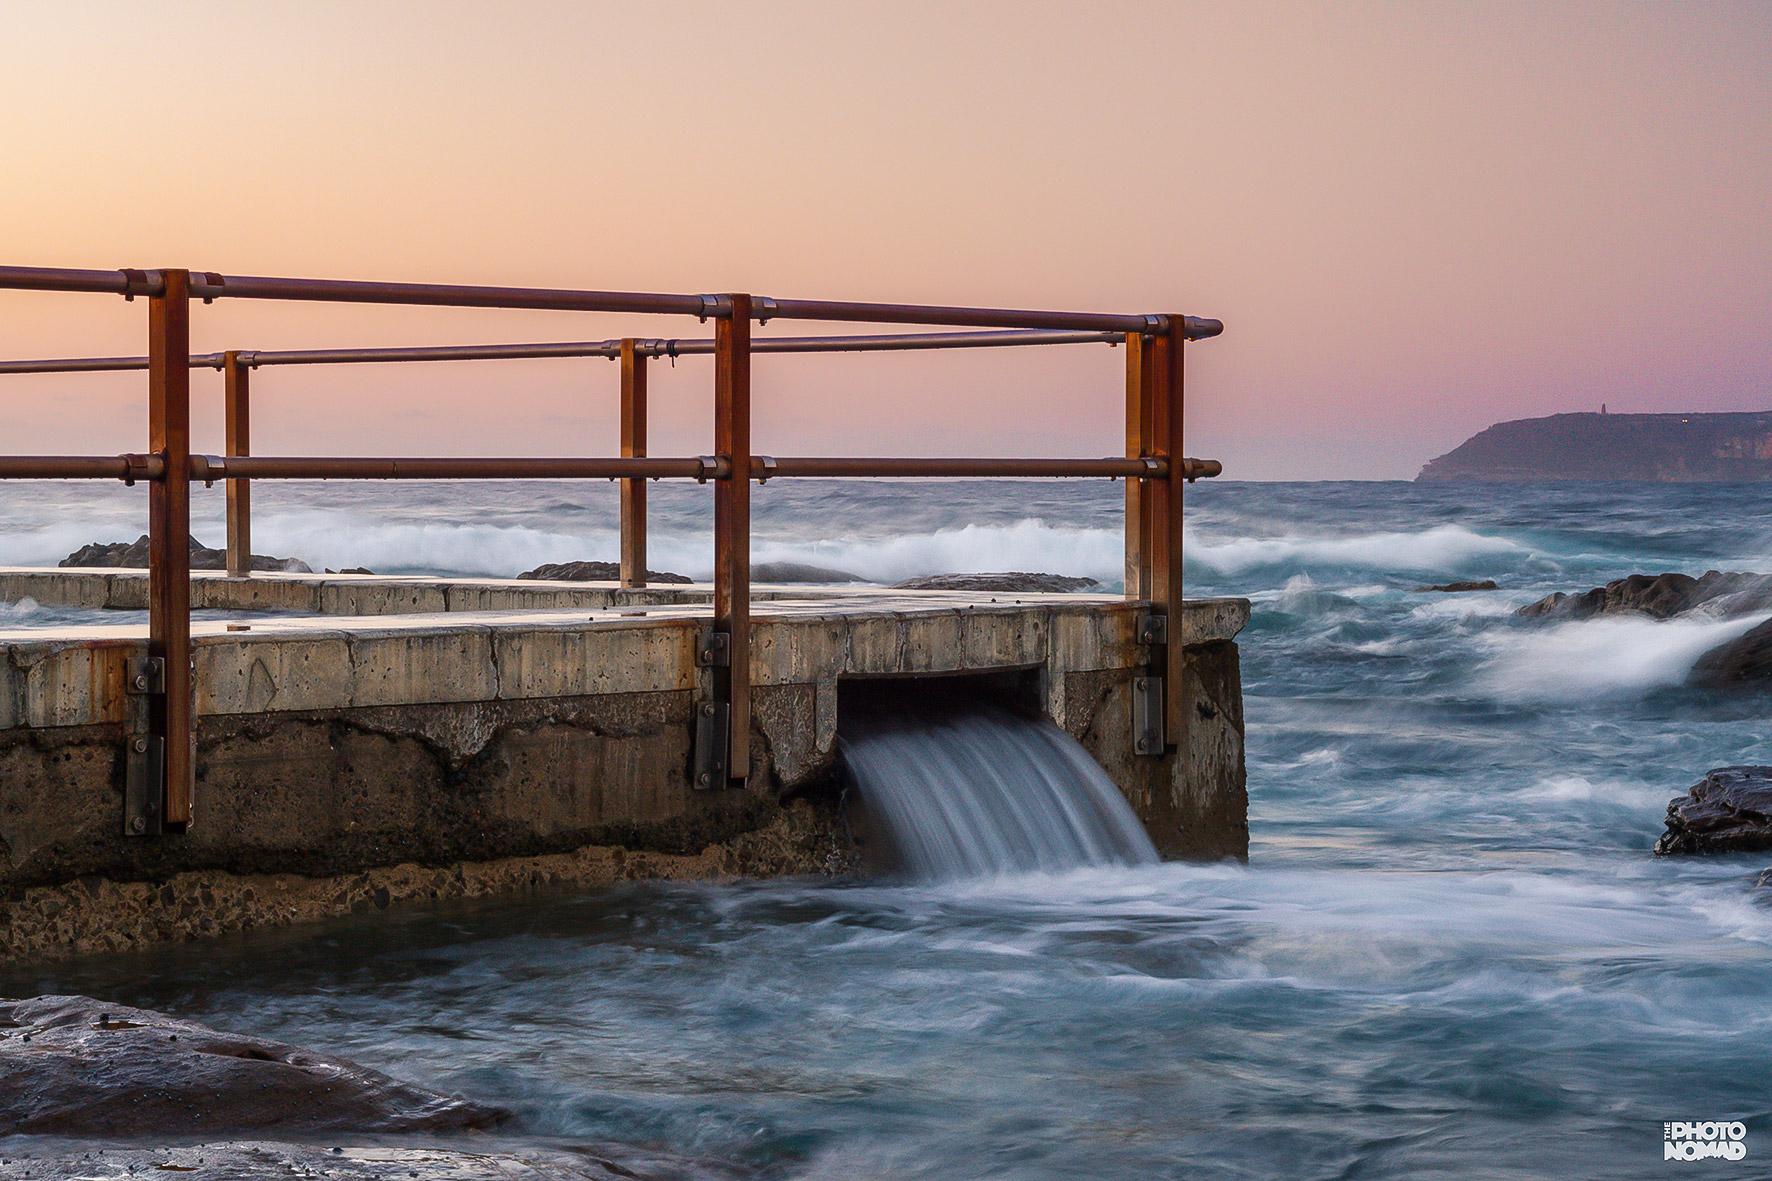 North Curl Curl Rock Pool, NSW